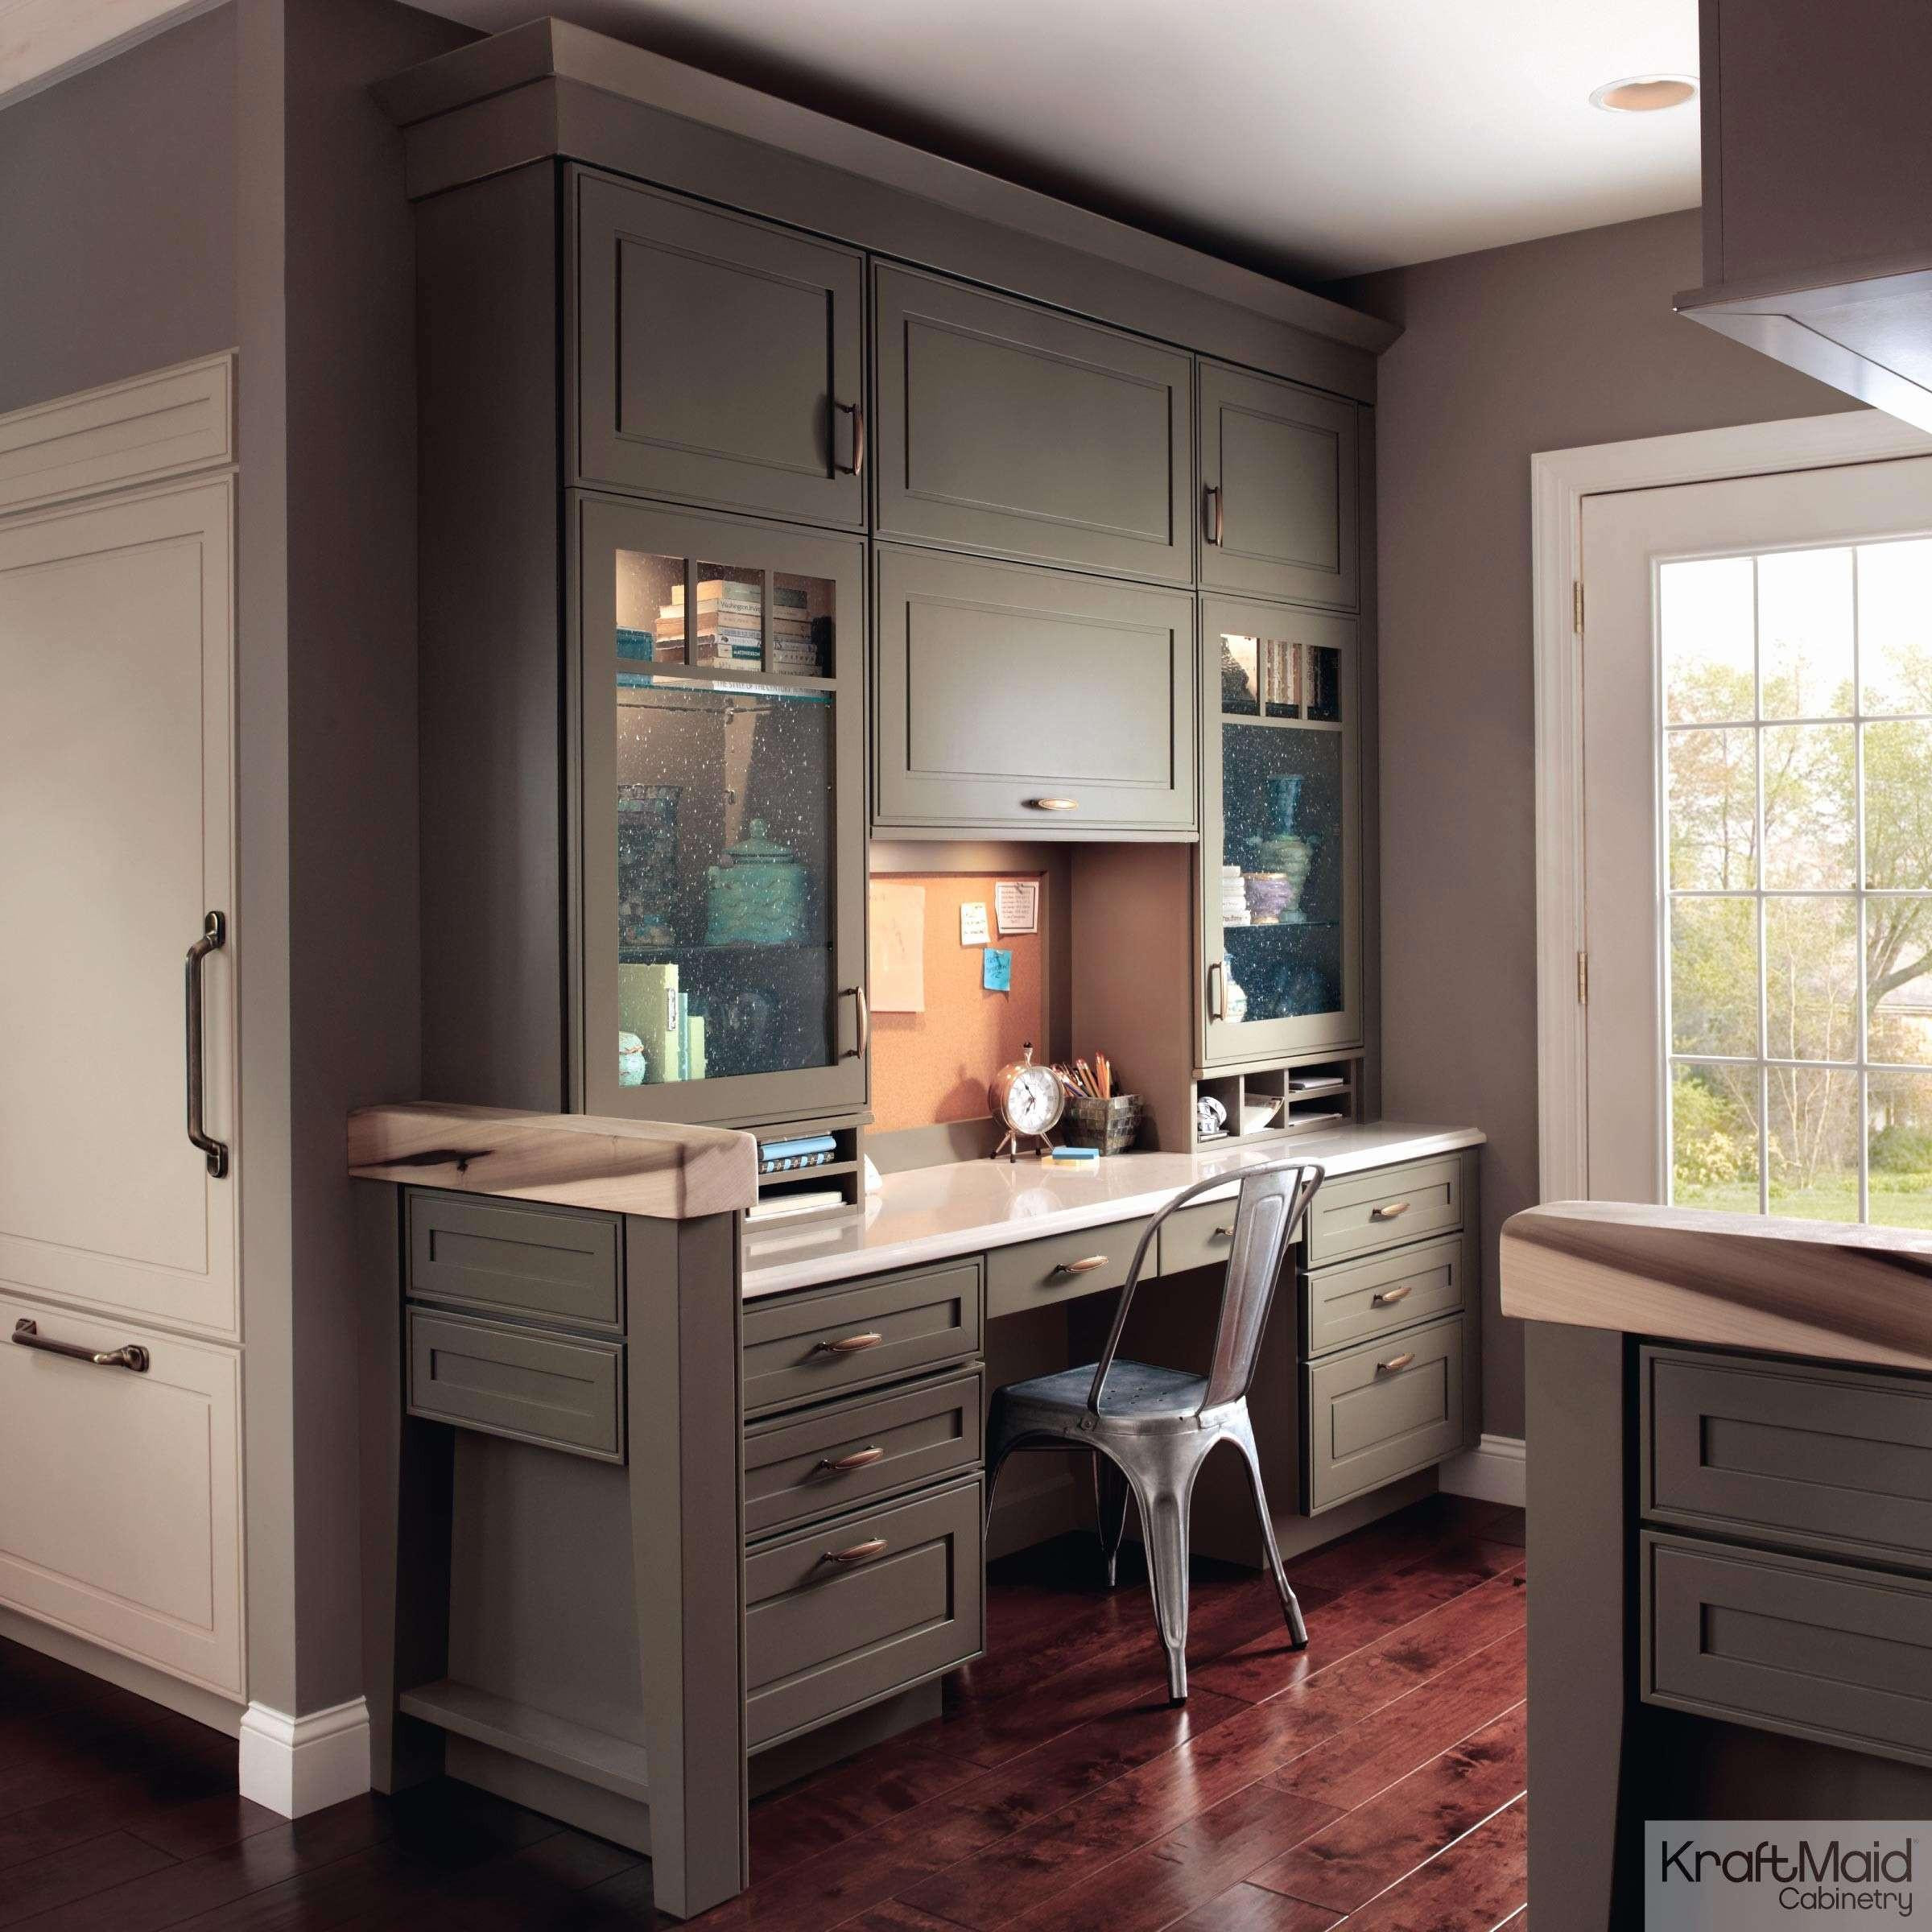 hardwood flooring blog of 10 best of maple kitchen cabinets with hardwood floors concept regarding cool kitchen backsplash pickled maple kitchen cabinets awesome kitchen cabinet 0d kitchen